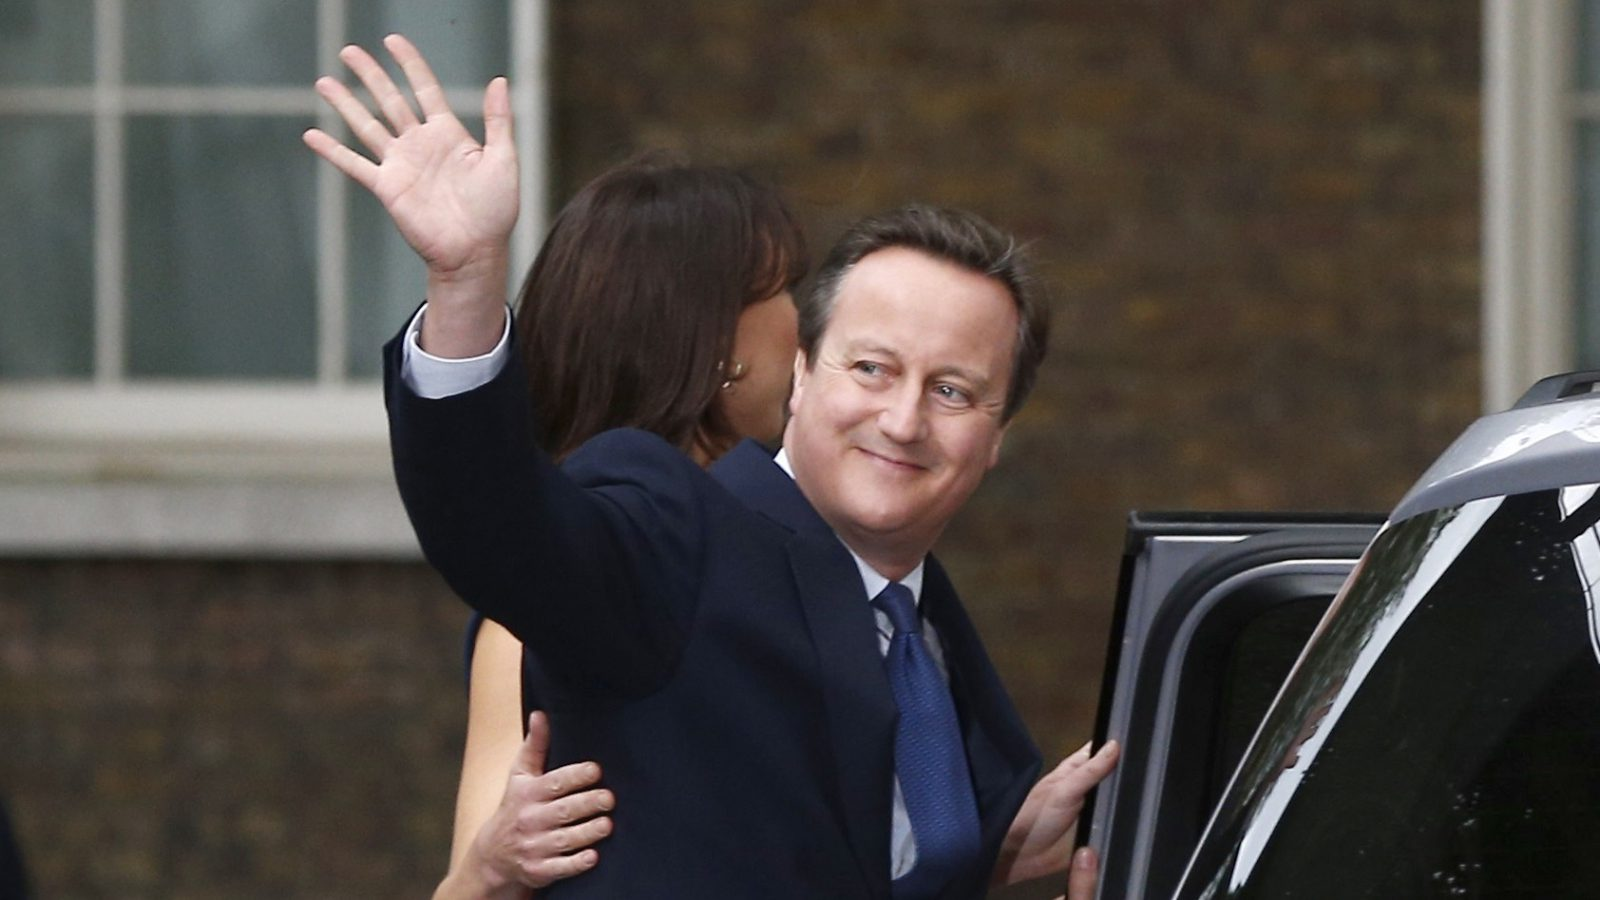 David Cameron waves.